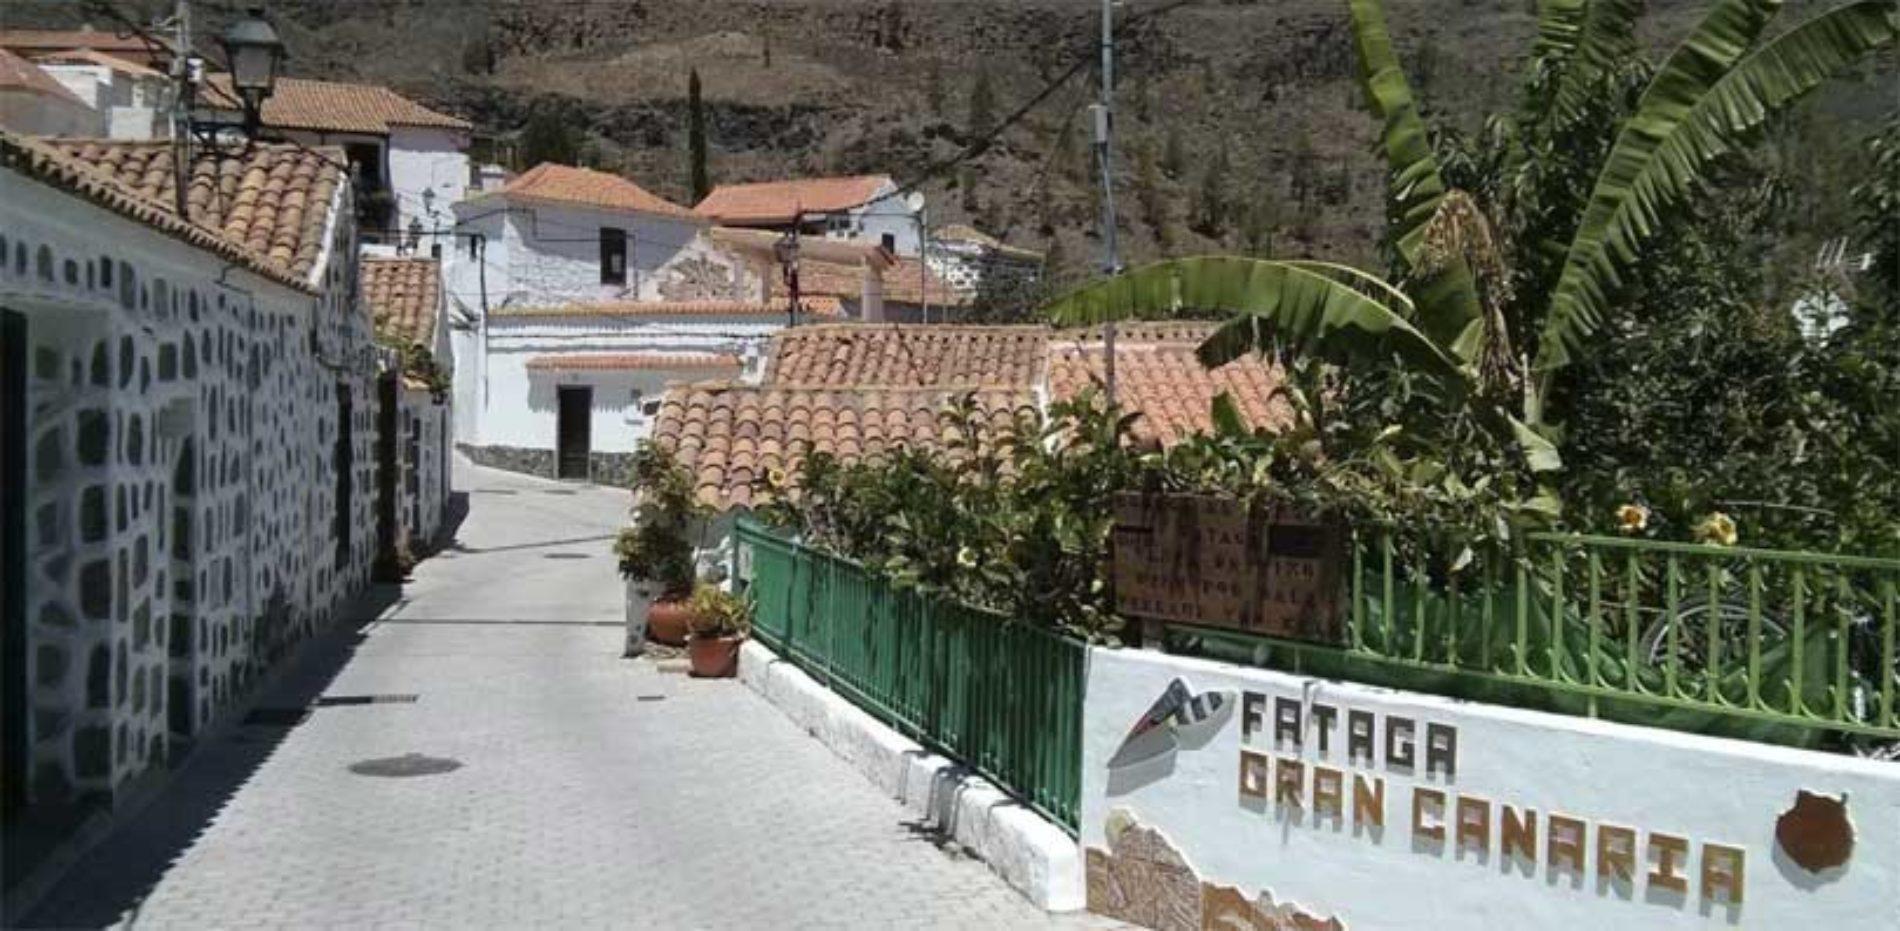 Fataga – den peneste fjellandsbyen sør på Gran Canaria